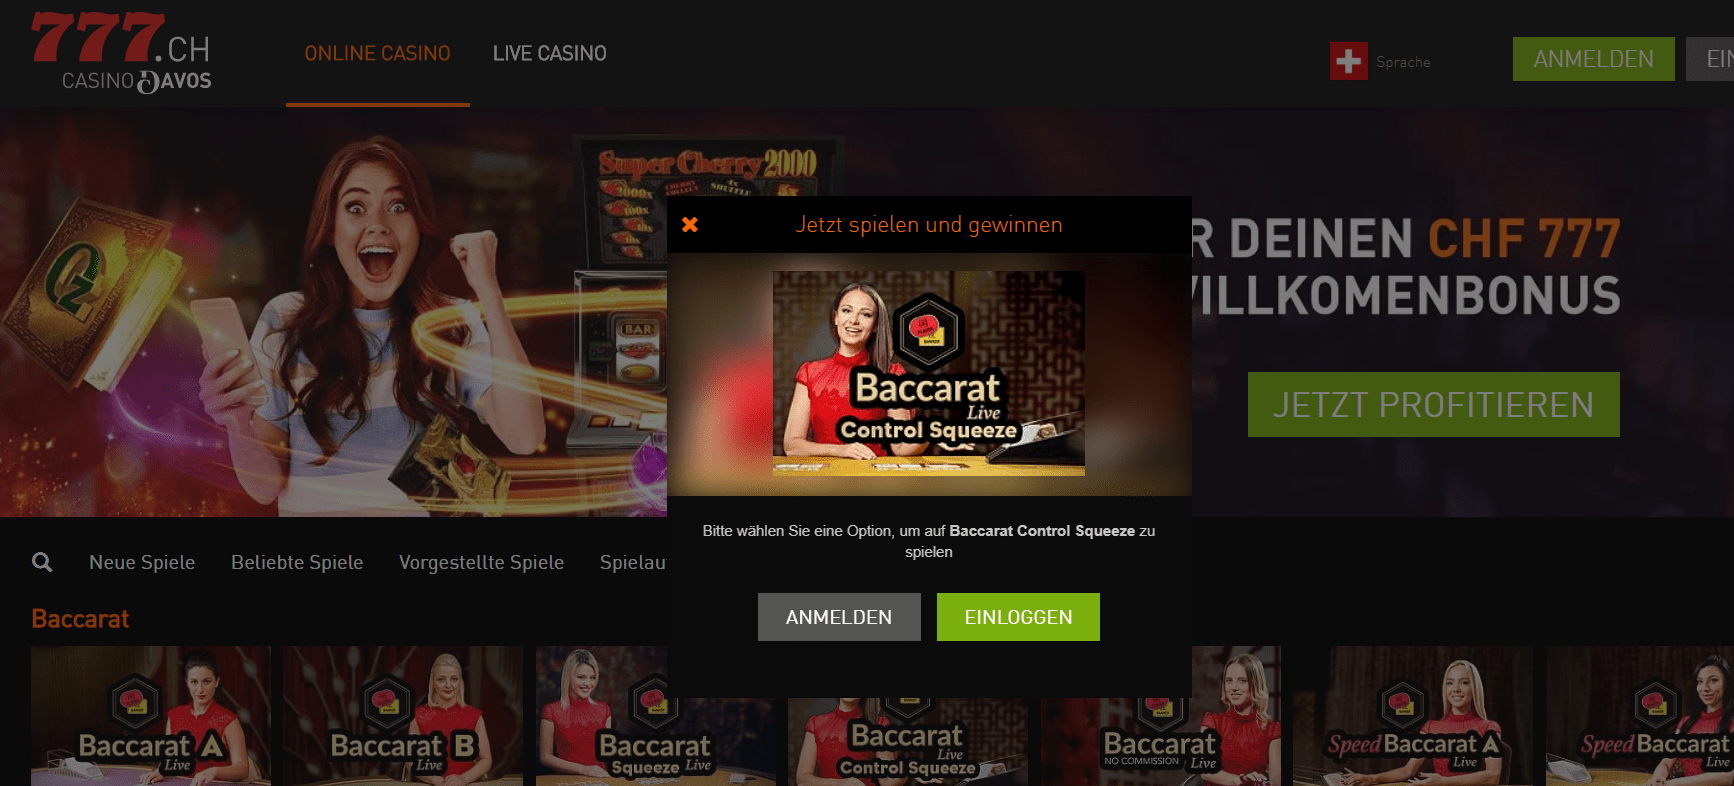 Casino777 ch baccarat spiele